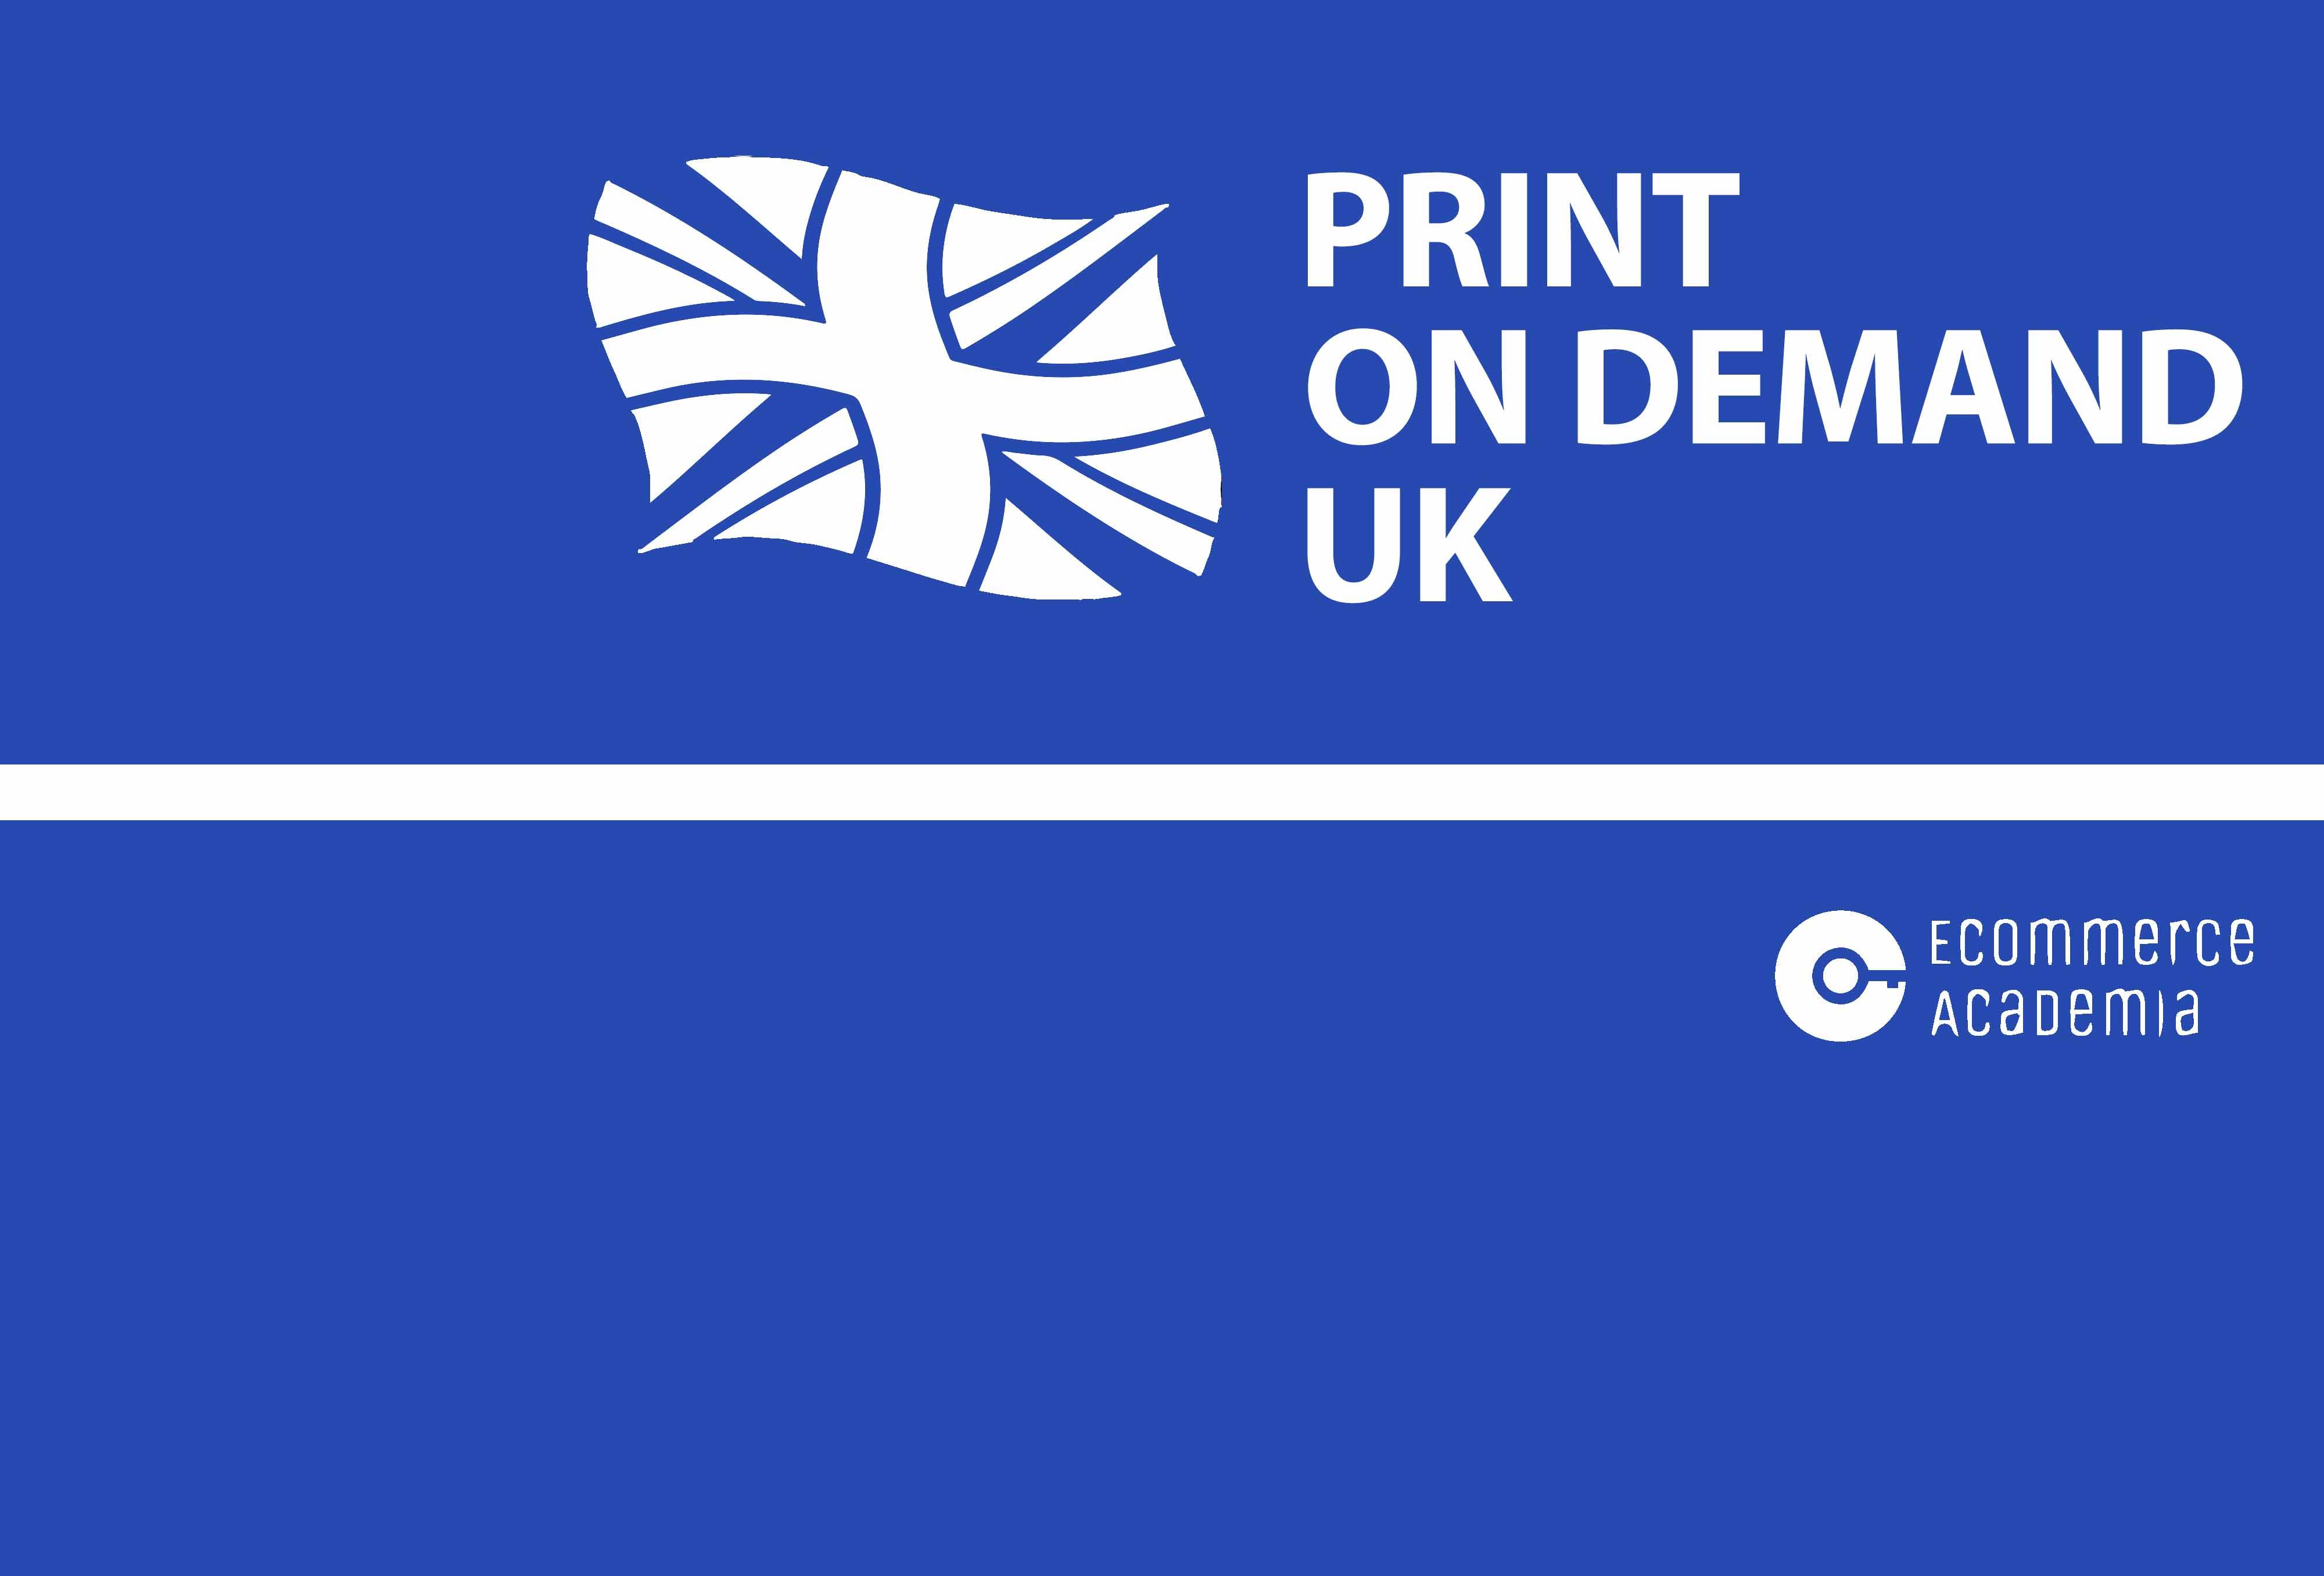 082ce9eba Print on demand UK services | Ecommerce Academia